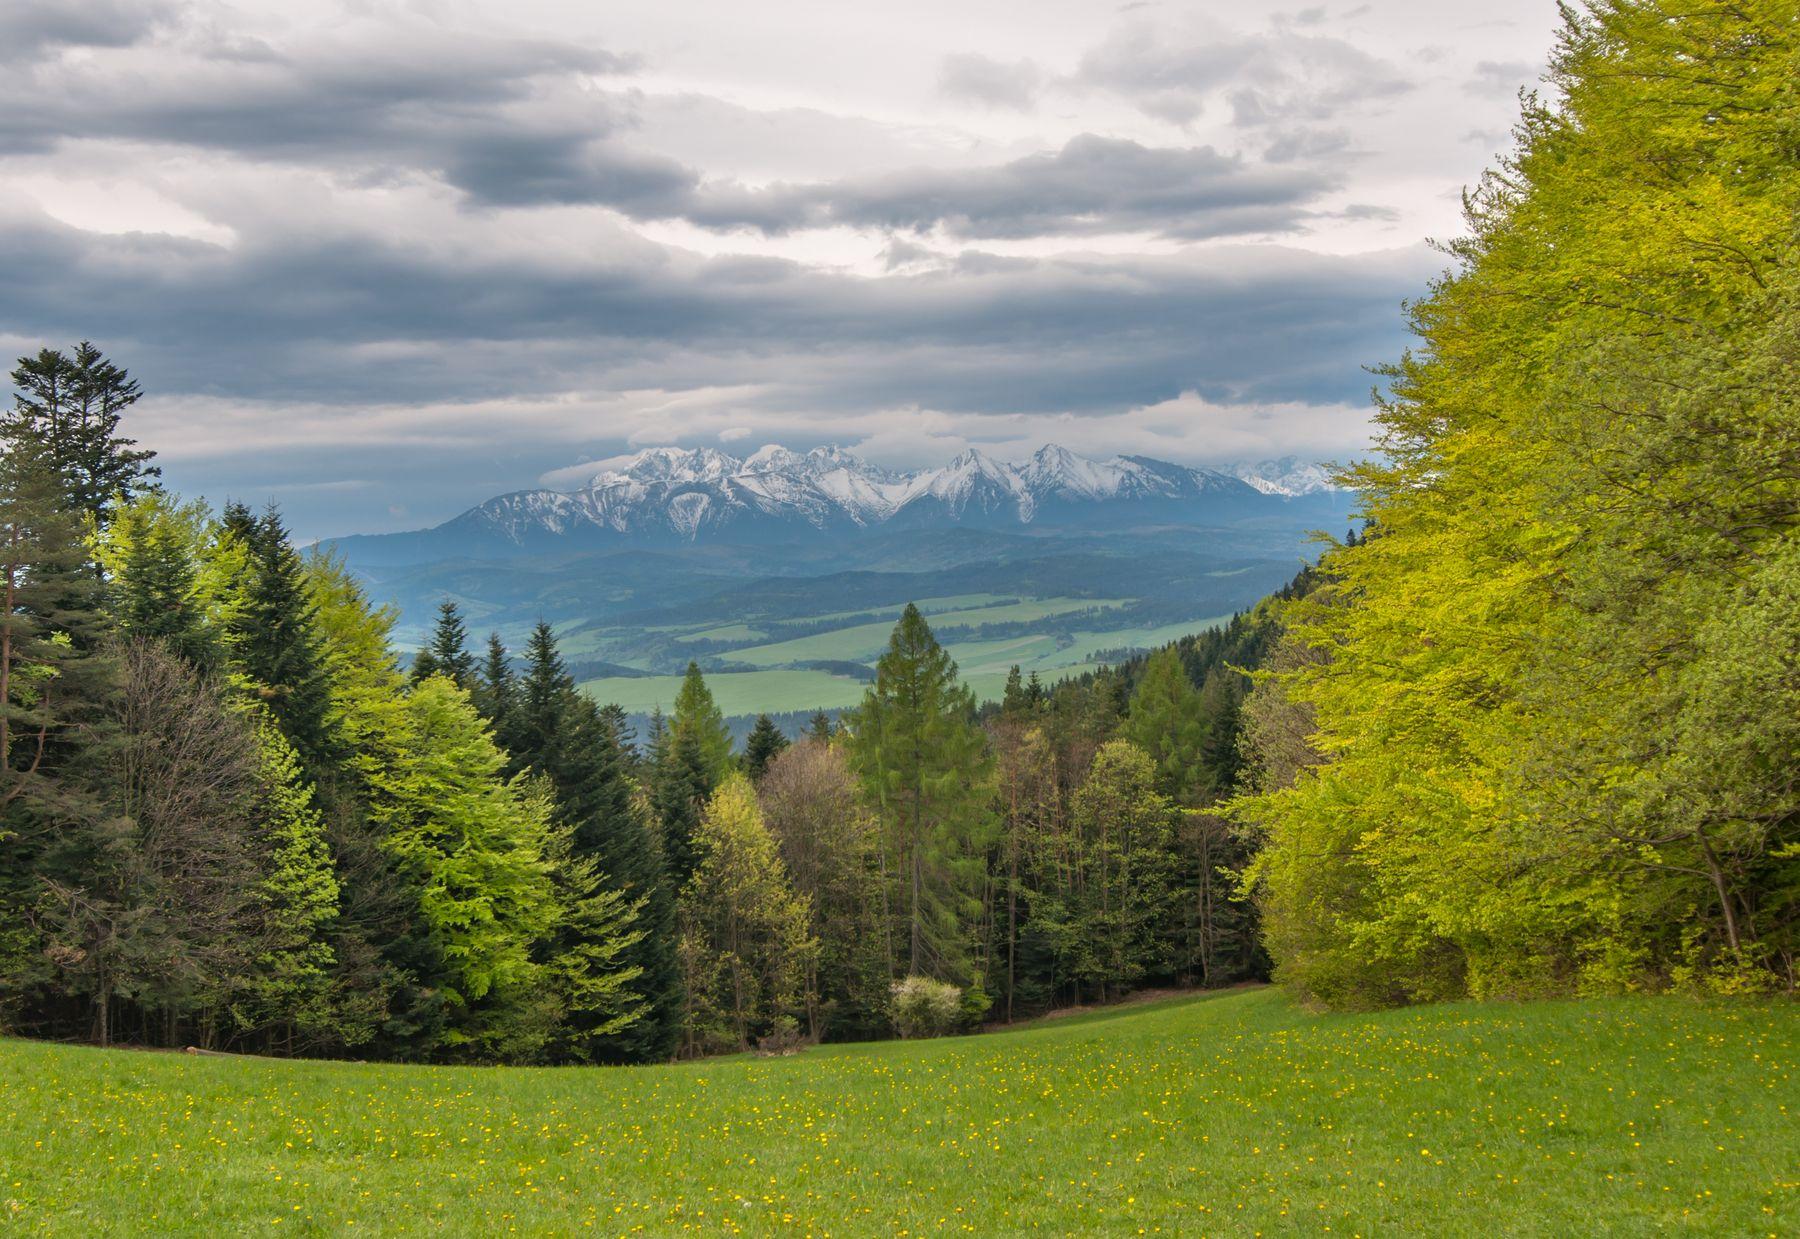 Весна! Весна! Ну наконец-то! Poland Polska góry mountains